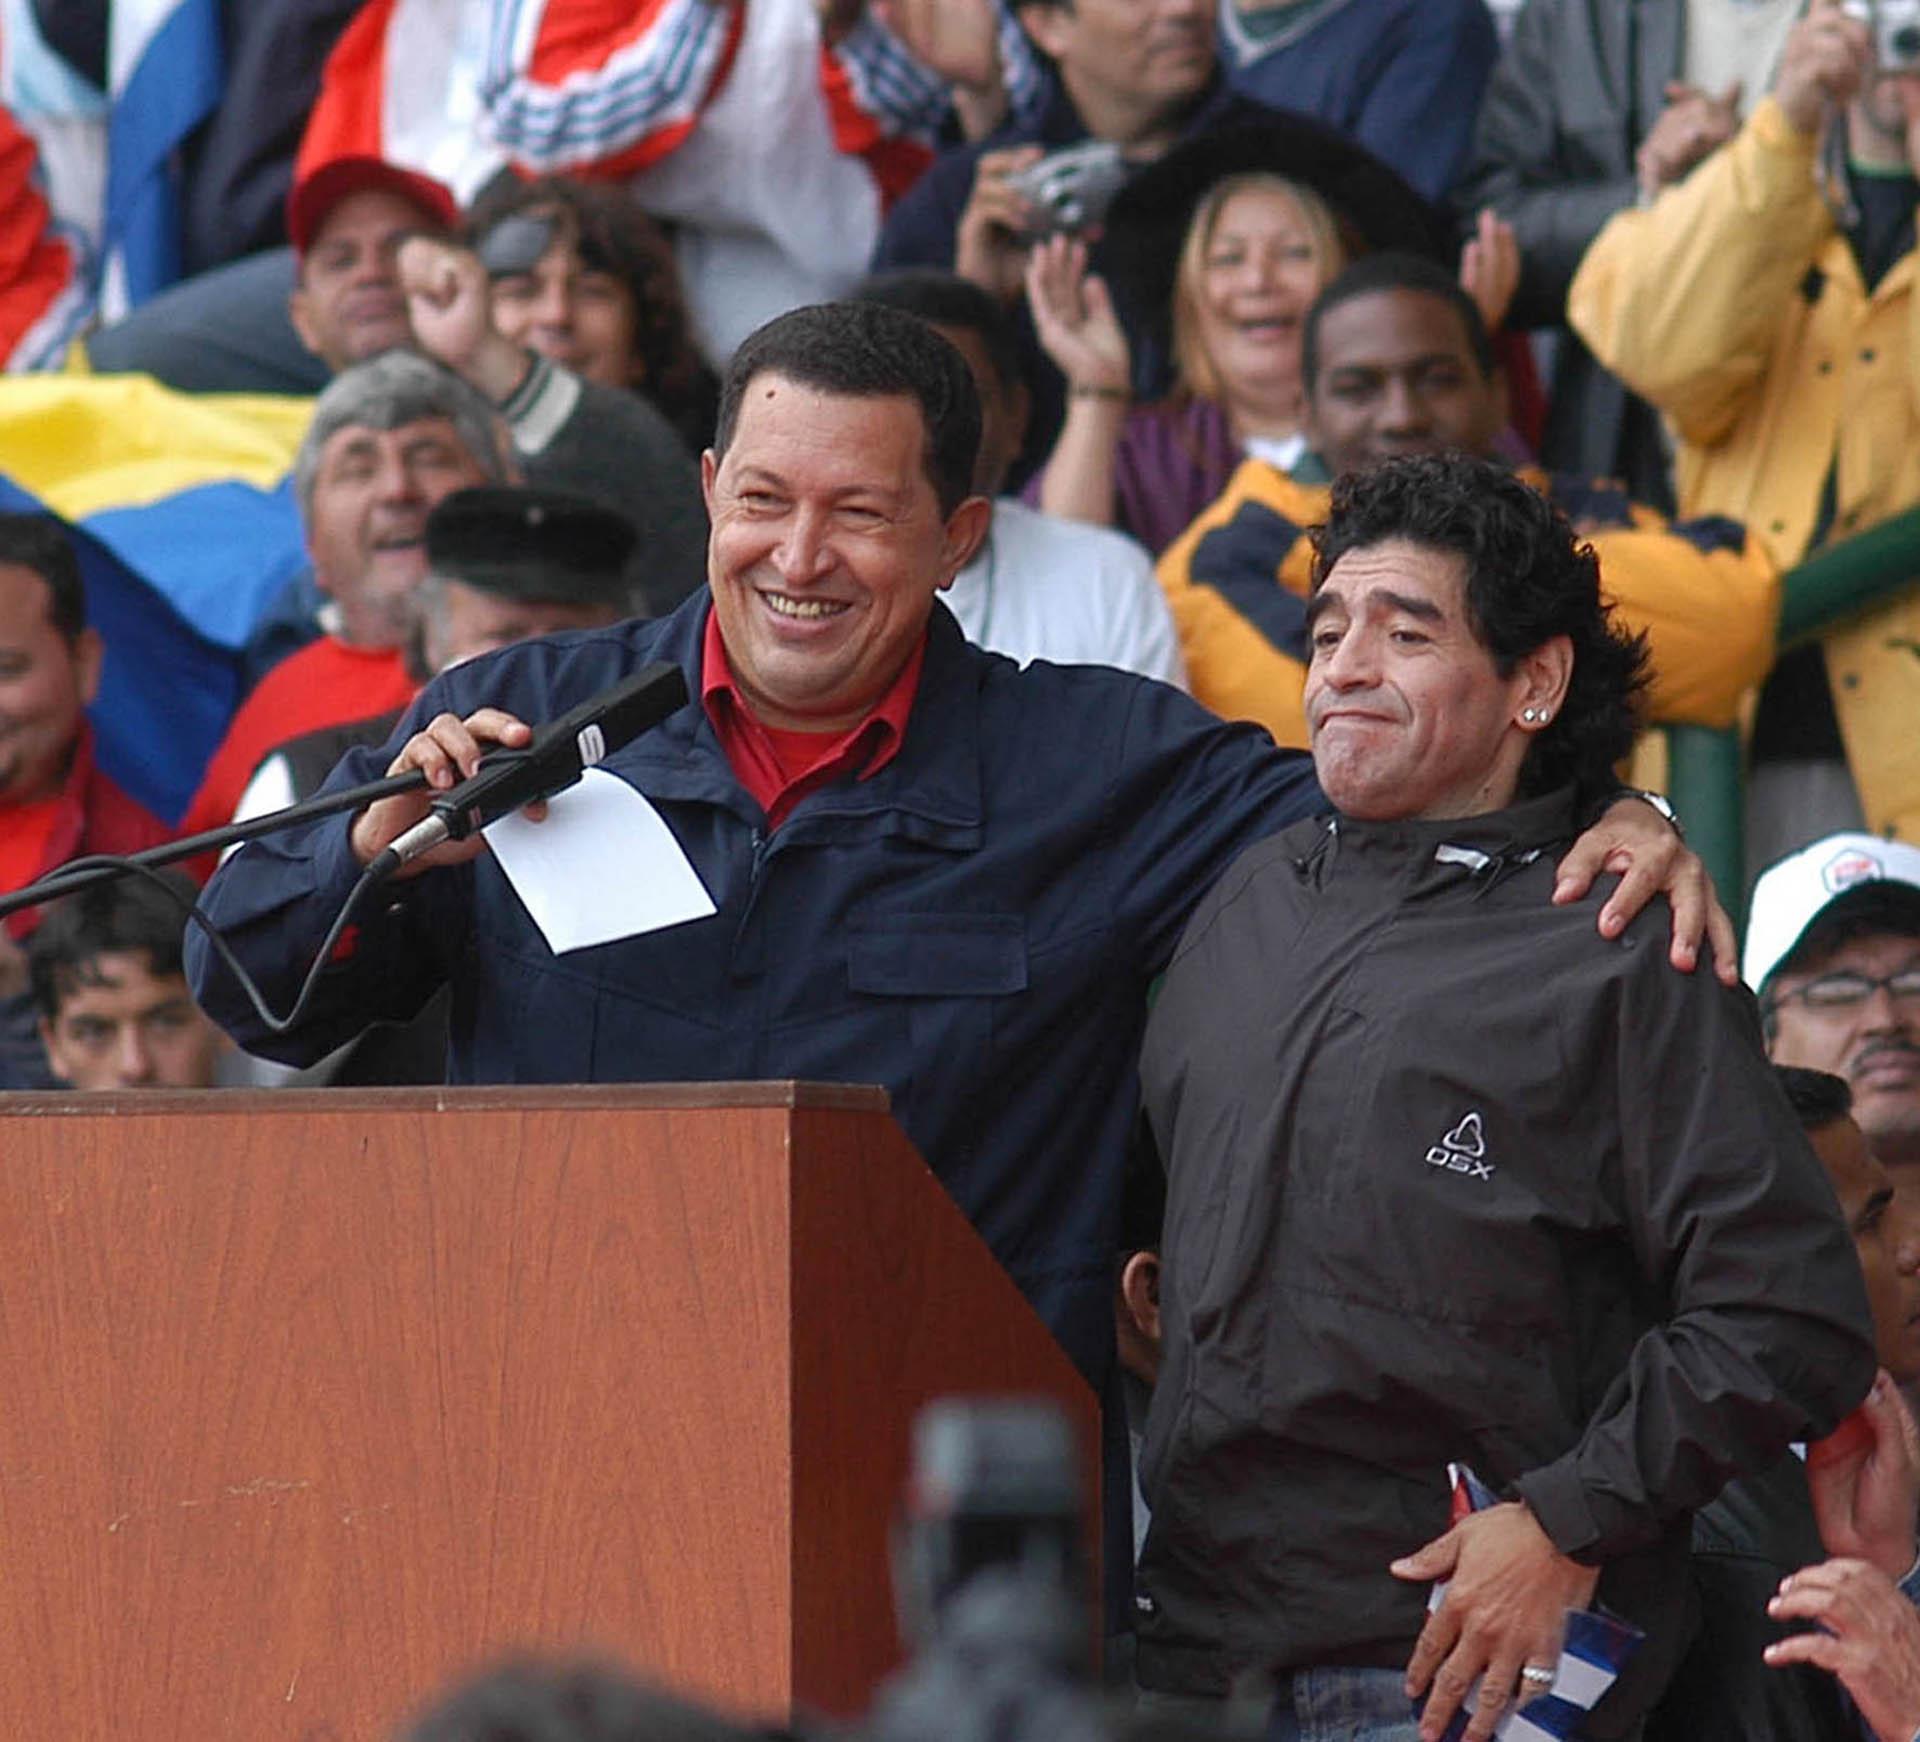 En el marco de la Cumbre de los Pueblos, en Mar del Plata, se unió a Hugo Chavez